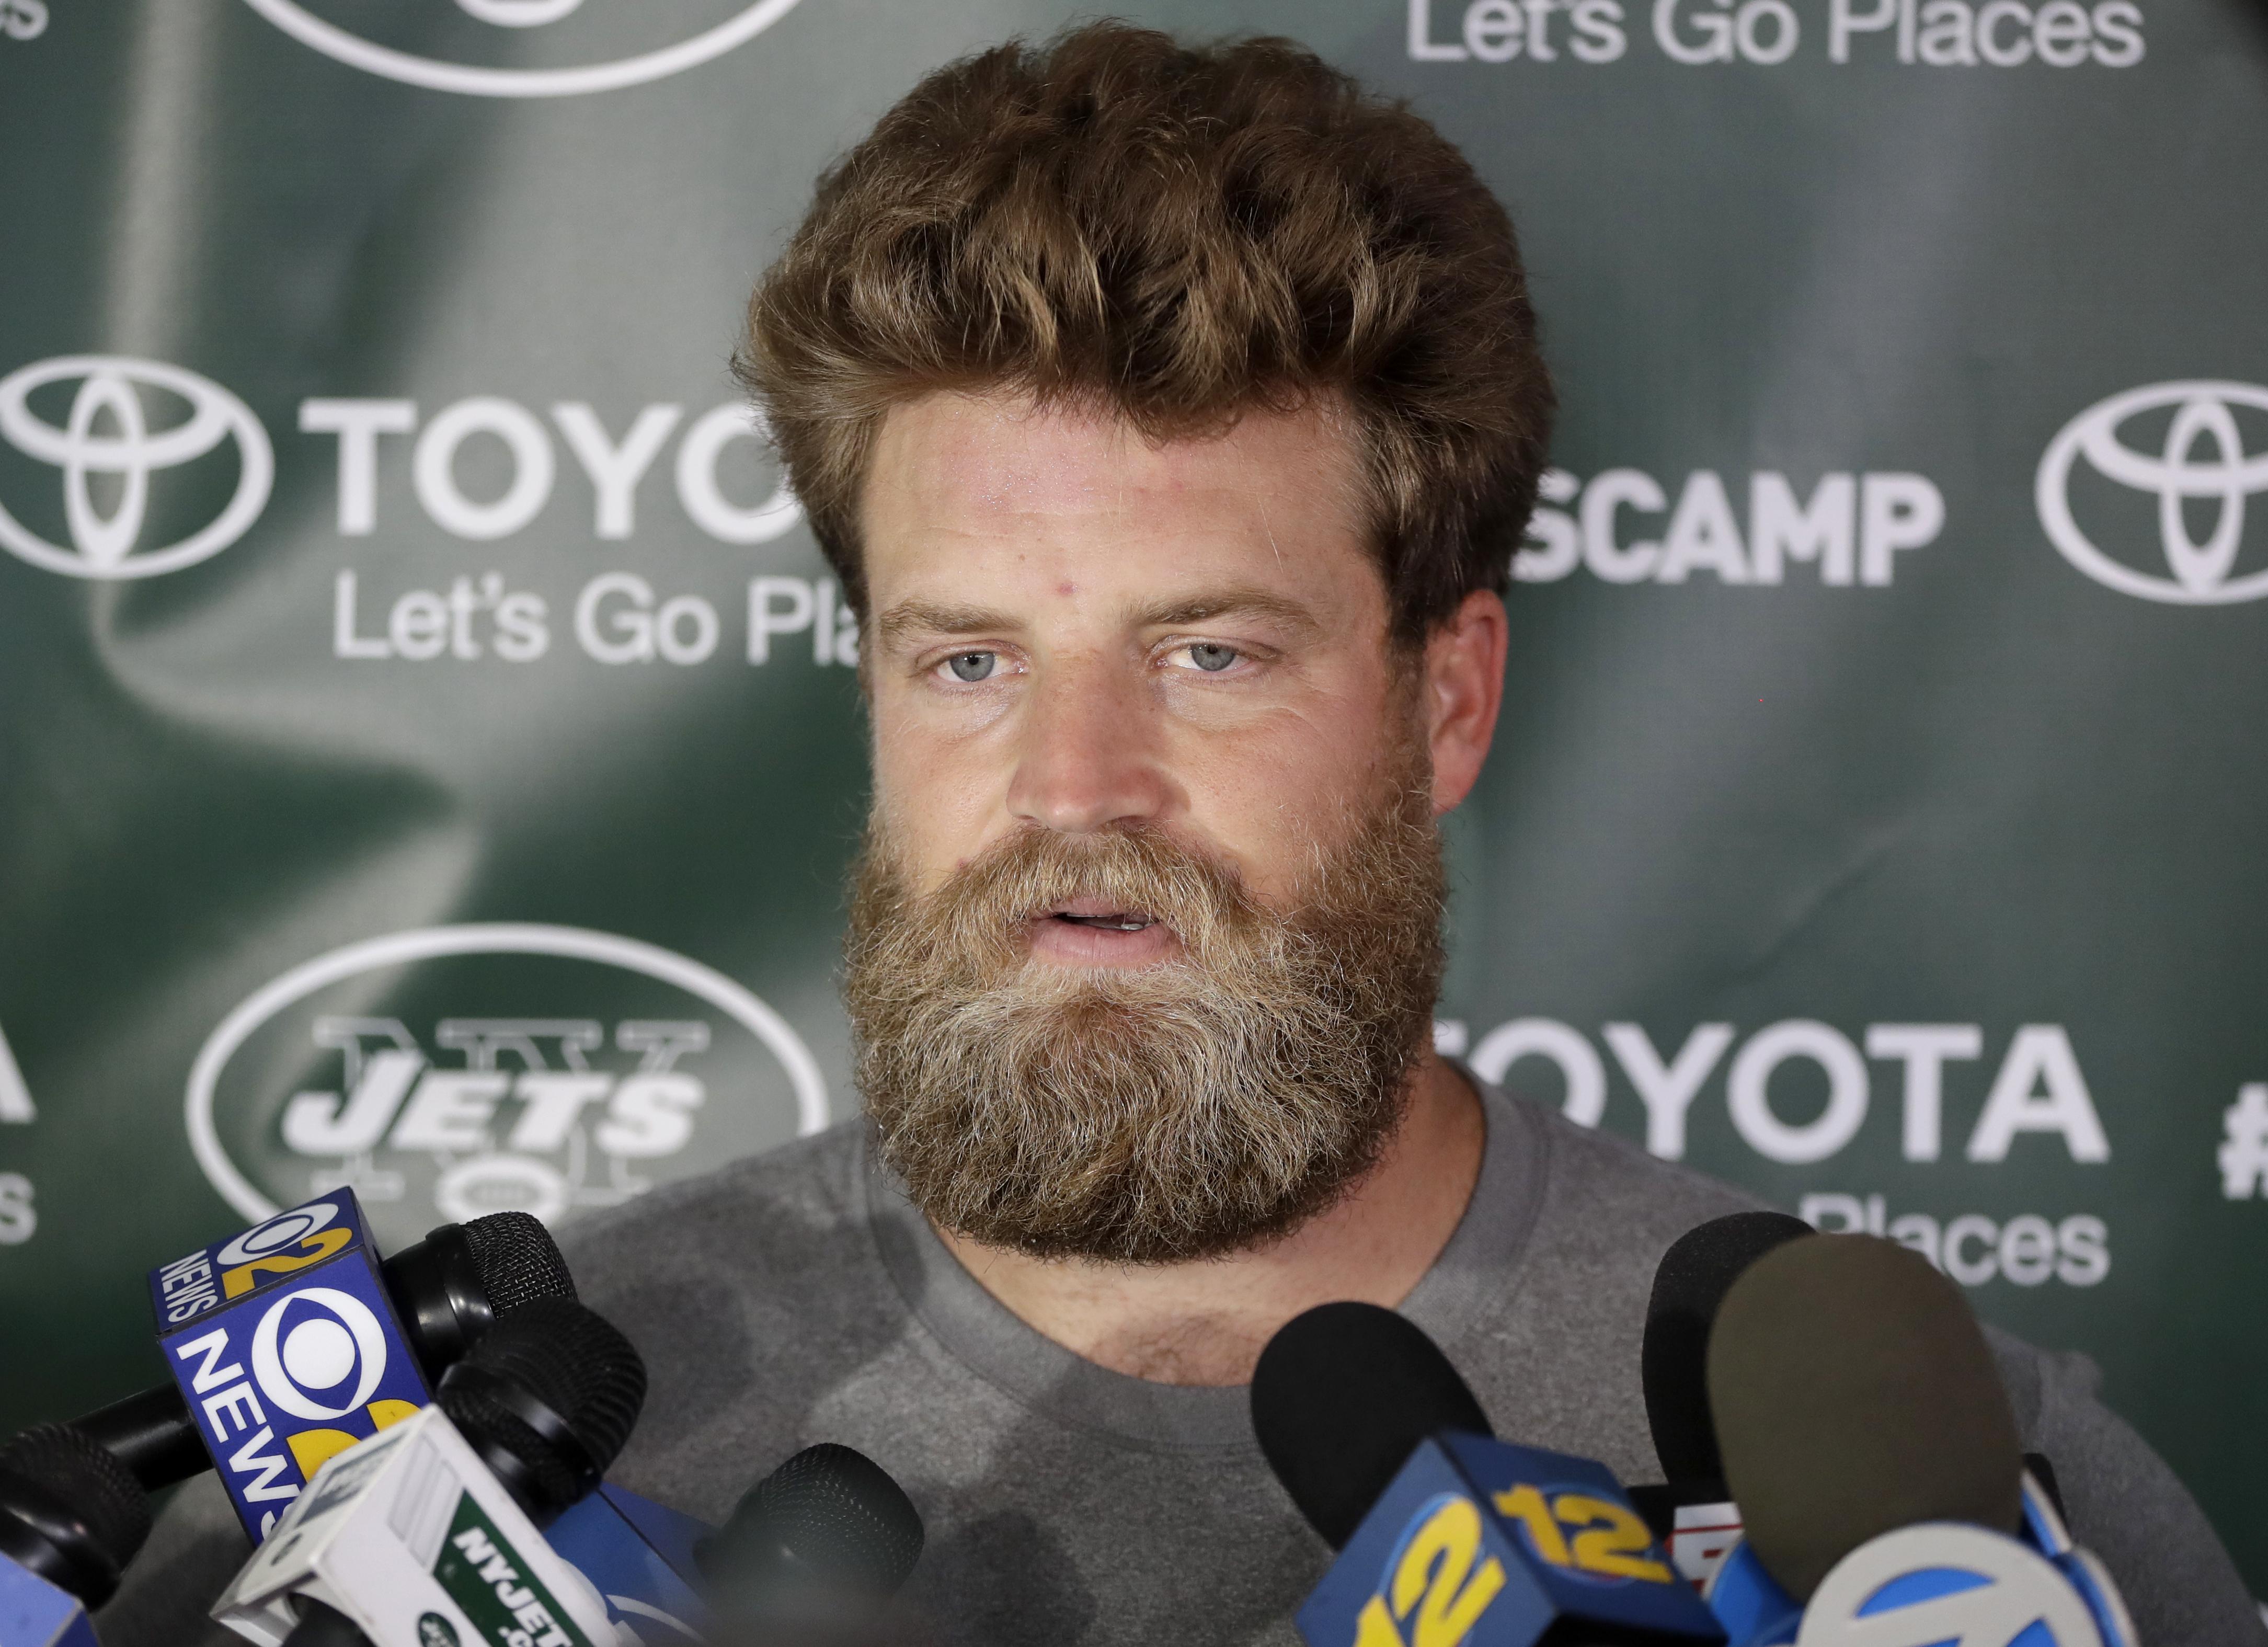 New York Jets quarterback Ryan Fitzpatrick talks to reporters during NFL football training camp, Thursday, July 28, 2016, in Florham Park, N.J. (AP Photo/Julio Cortez)